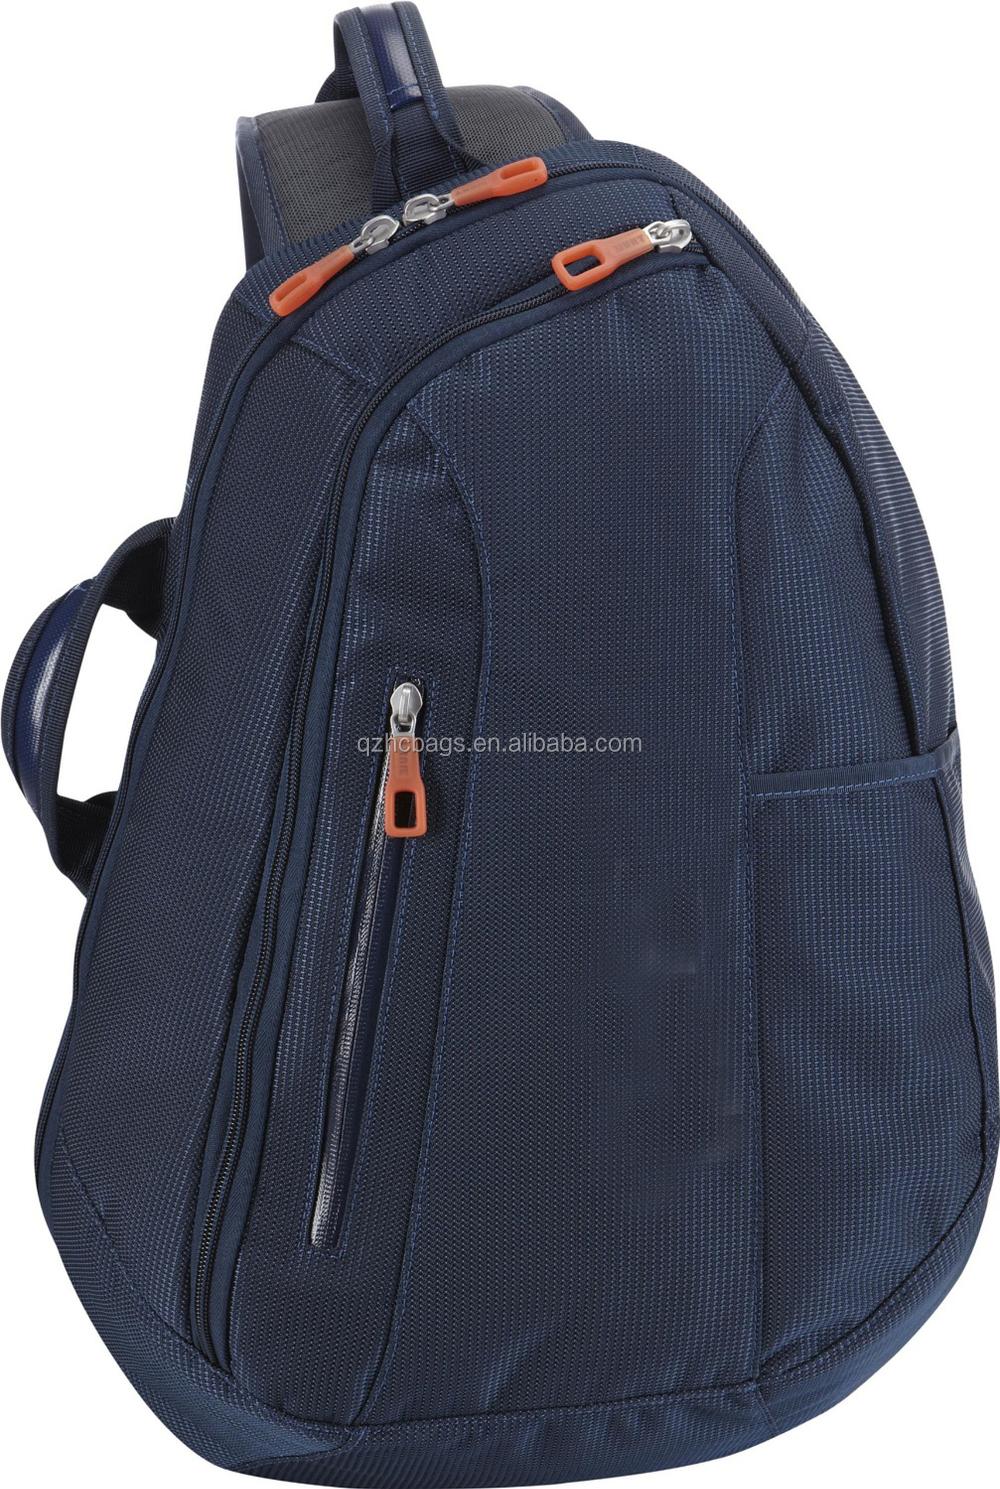 School bag new design - China New Design Kids Trolley School Bag With